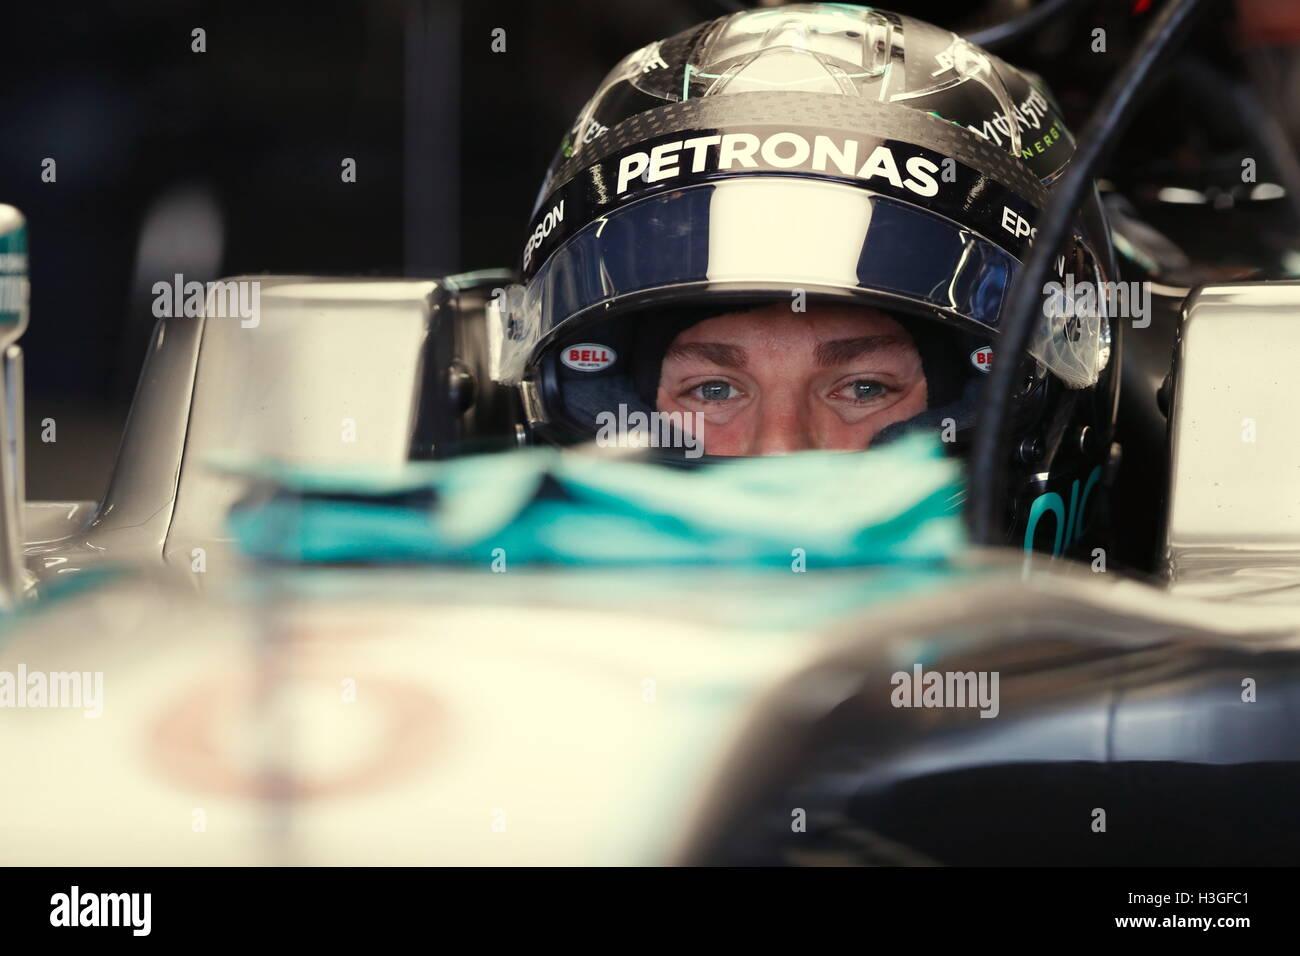 Suzuka, Japón. 8 Oct, 2016. Nico Rosberg (GER) : japonés de F1 Grand Prix de Fórmula 1 en el circuito de Suzuka Foto de stock